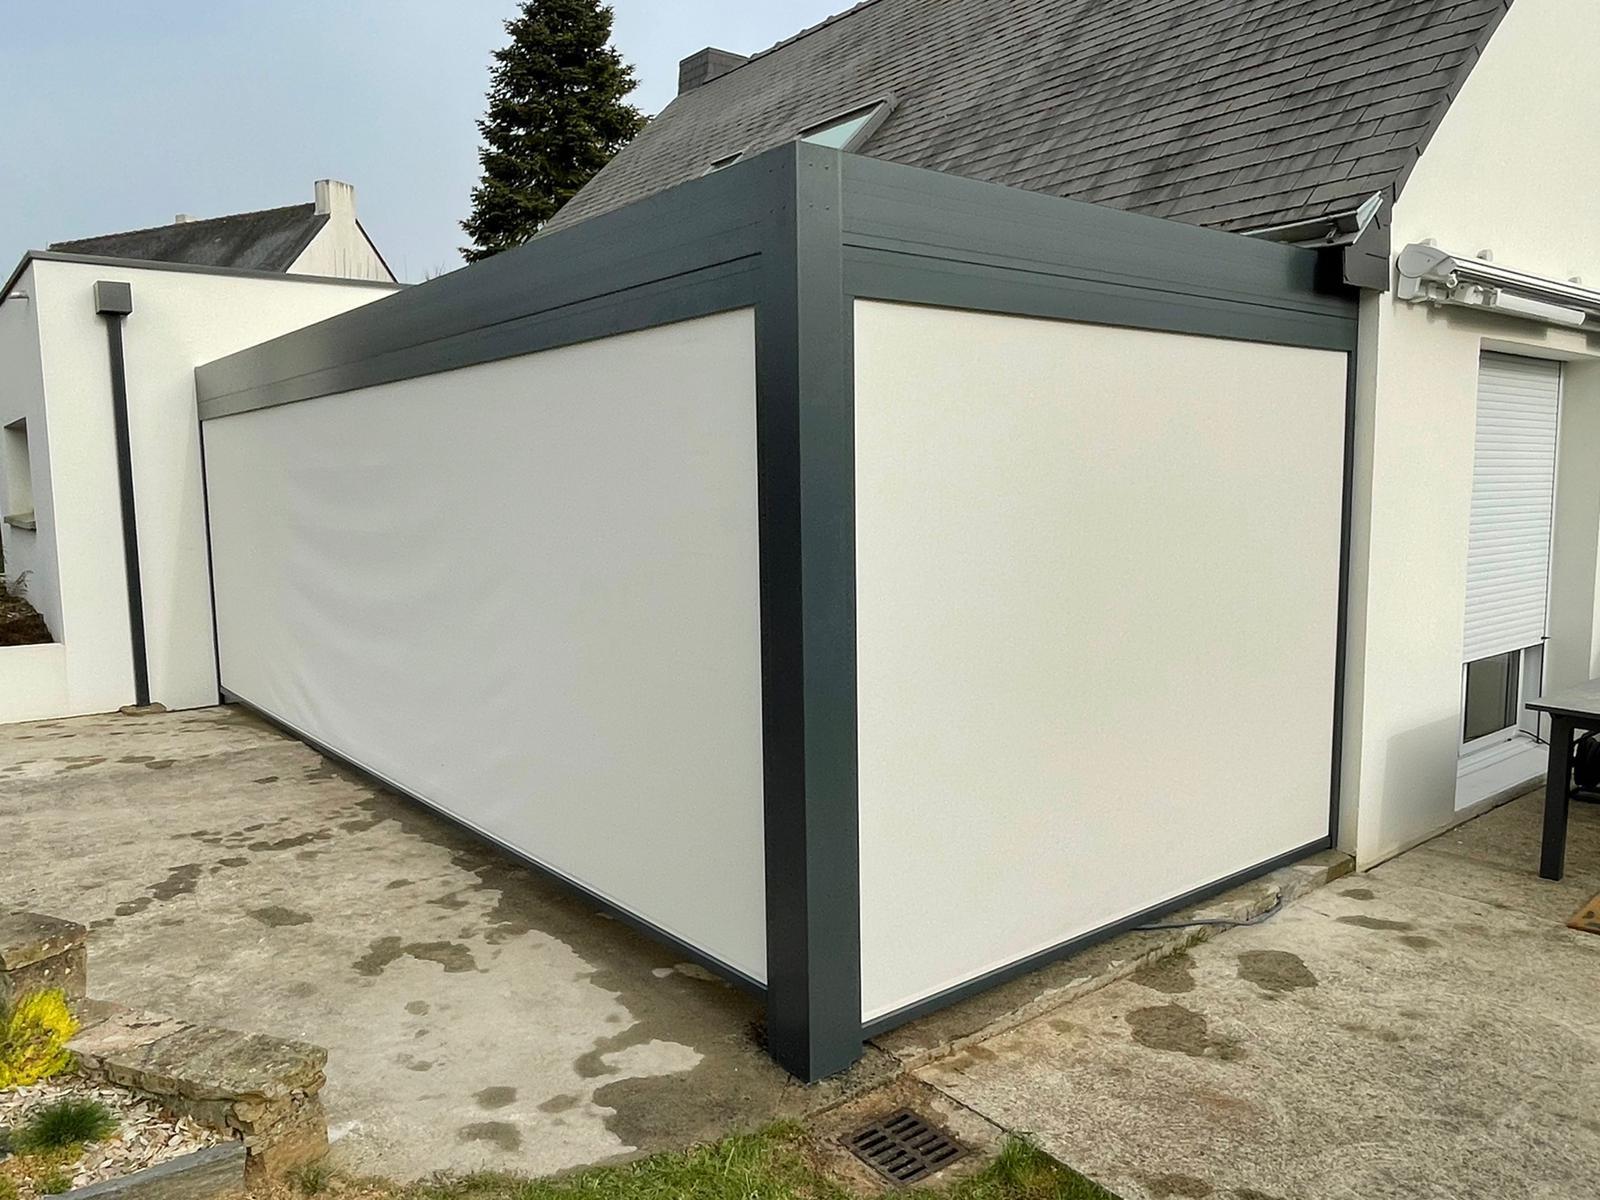 Pergola Bioclimatique aluminium Solisysteme Treillieres - Orvault - Nantes 1